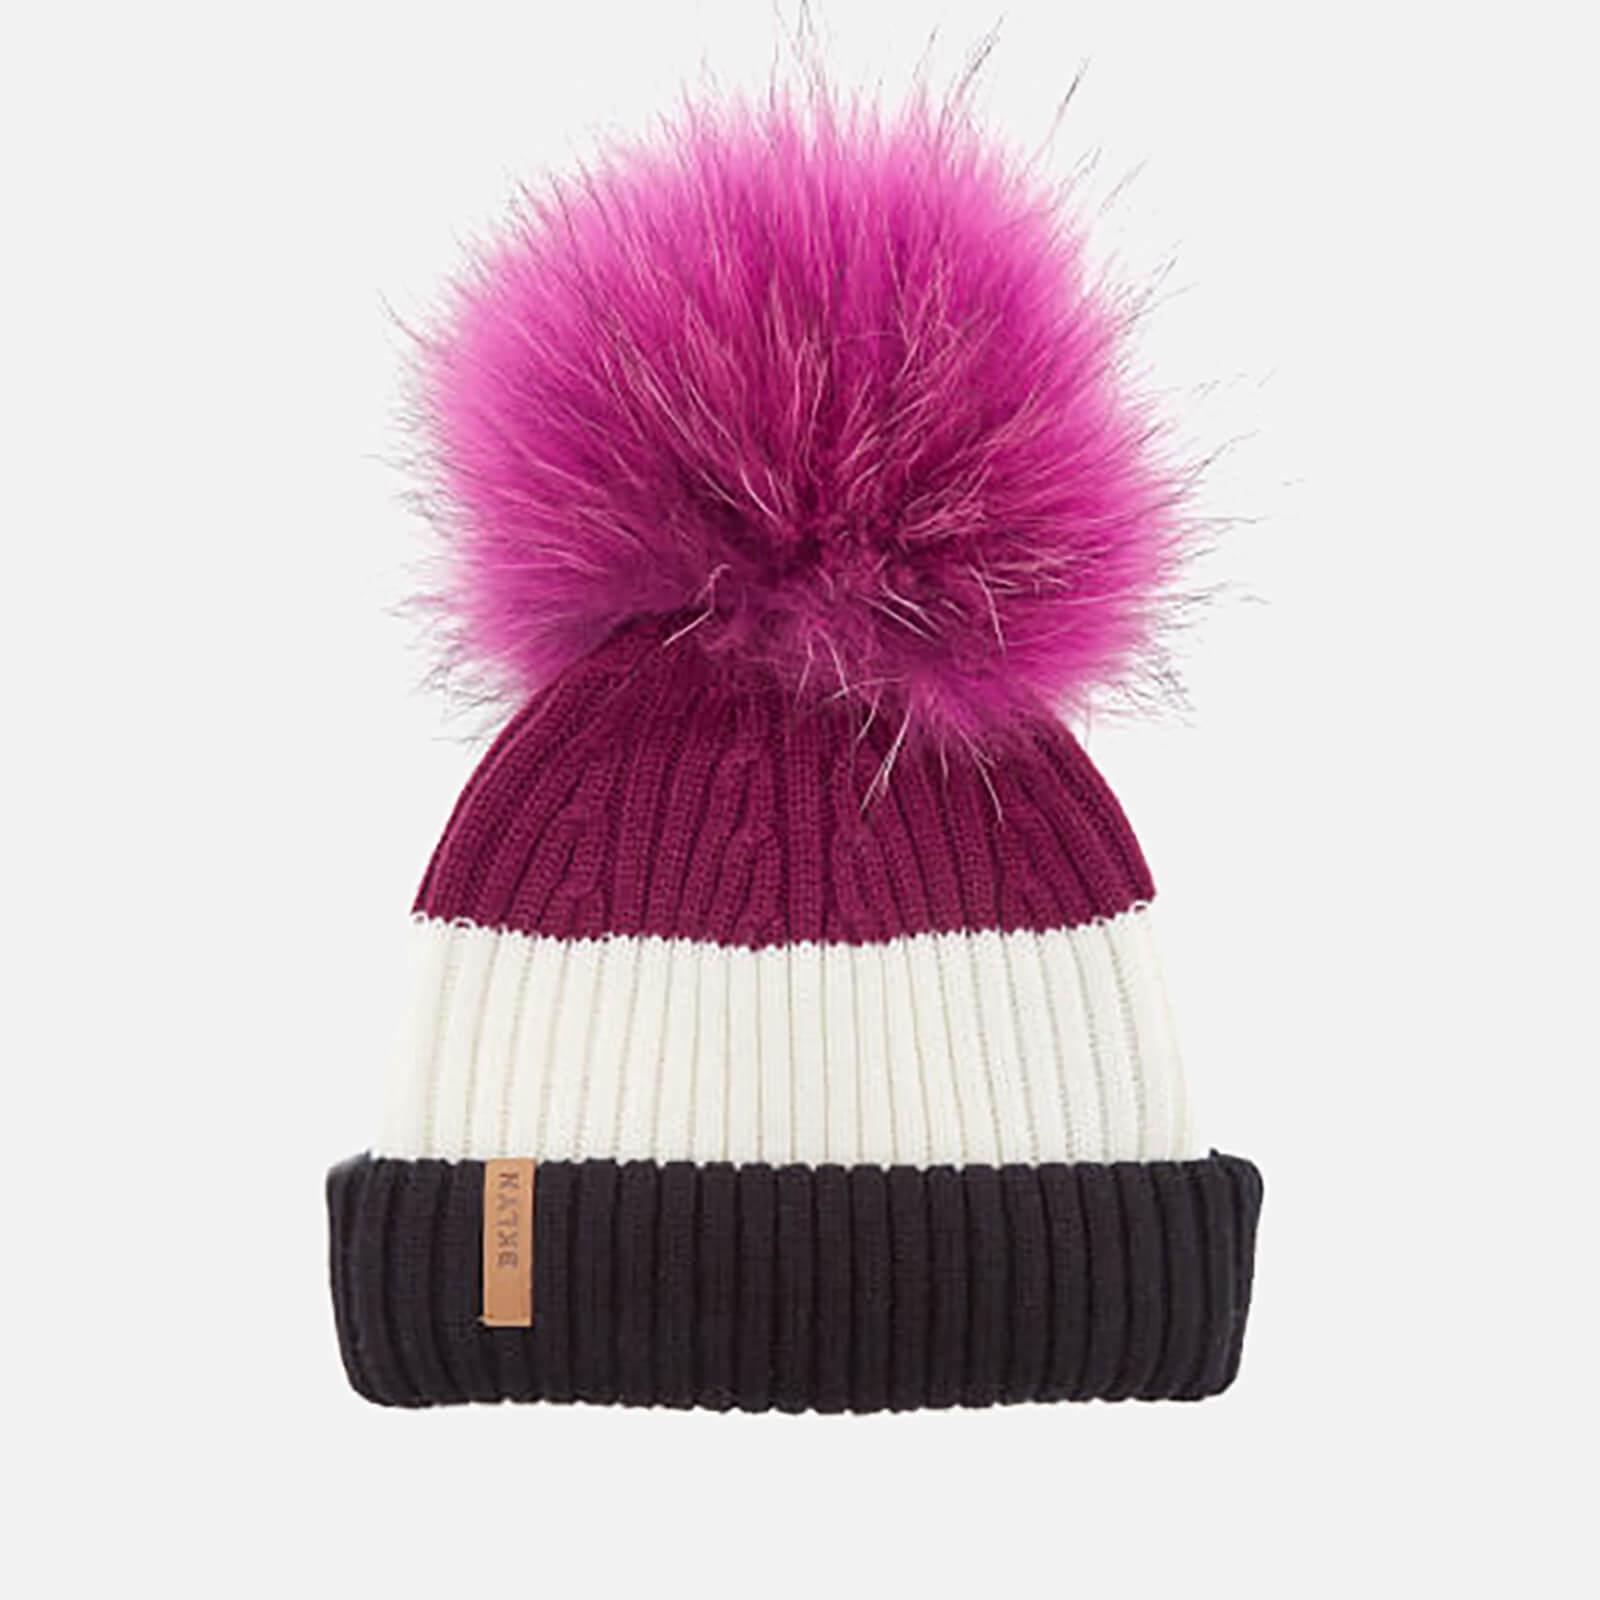 9768ec9a1 BKLYN Women's Merino Wool Hat with Fuchsia Pink Pom Pom - Black/White/Wine